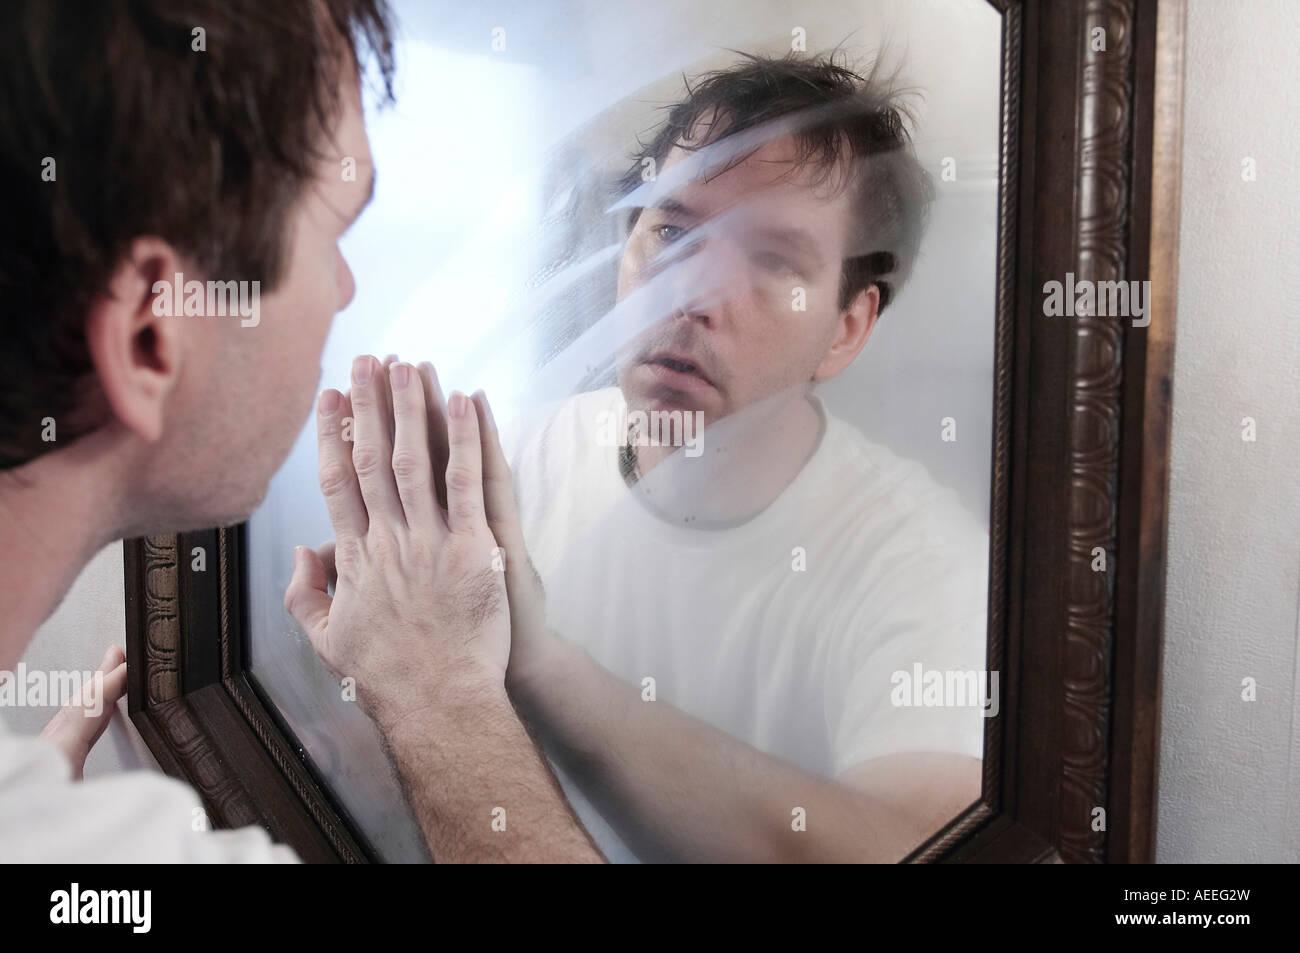 how to clean a foggy mirror